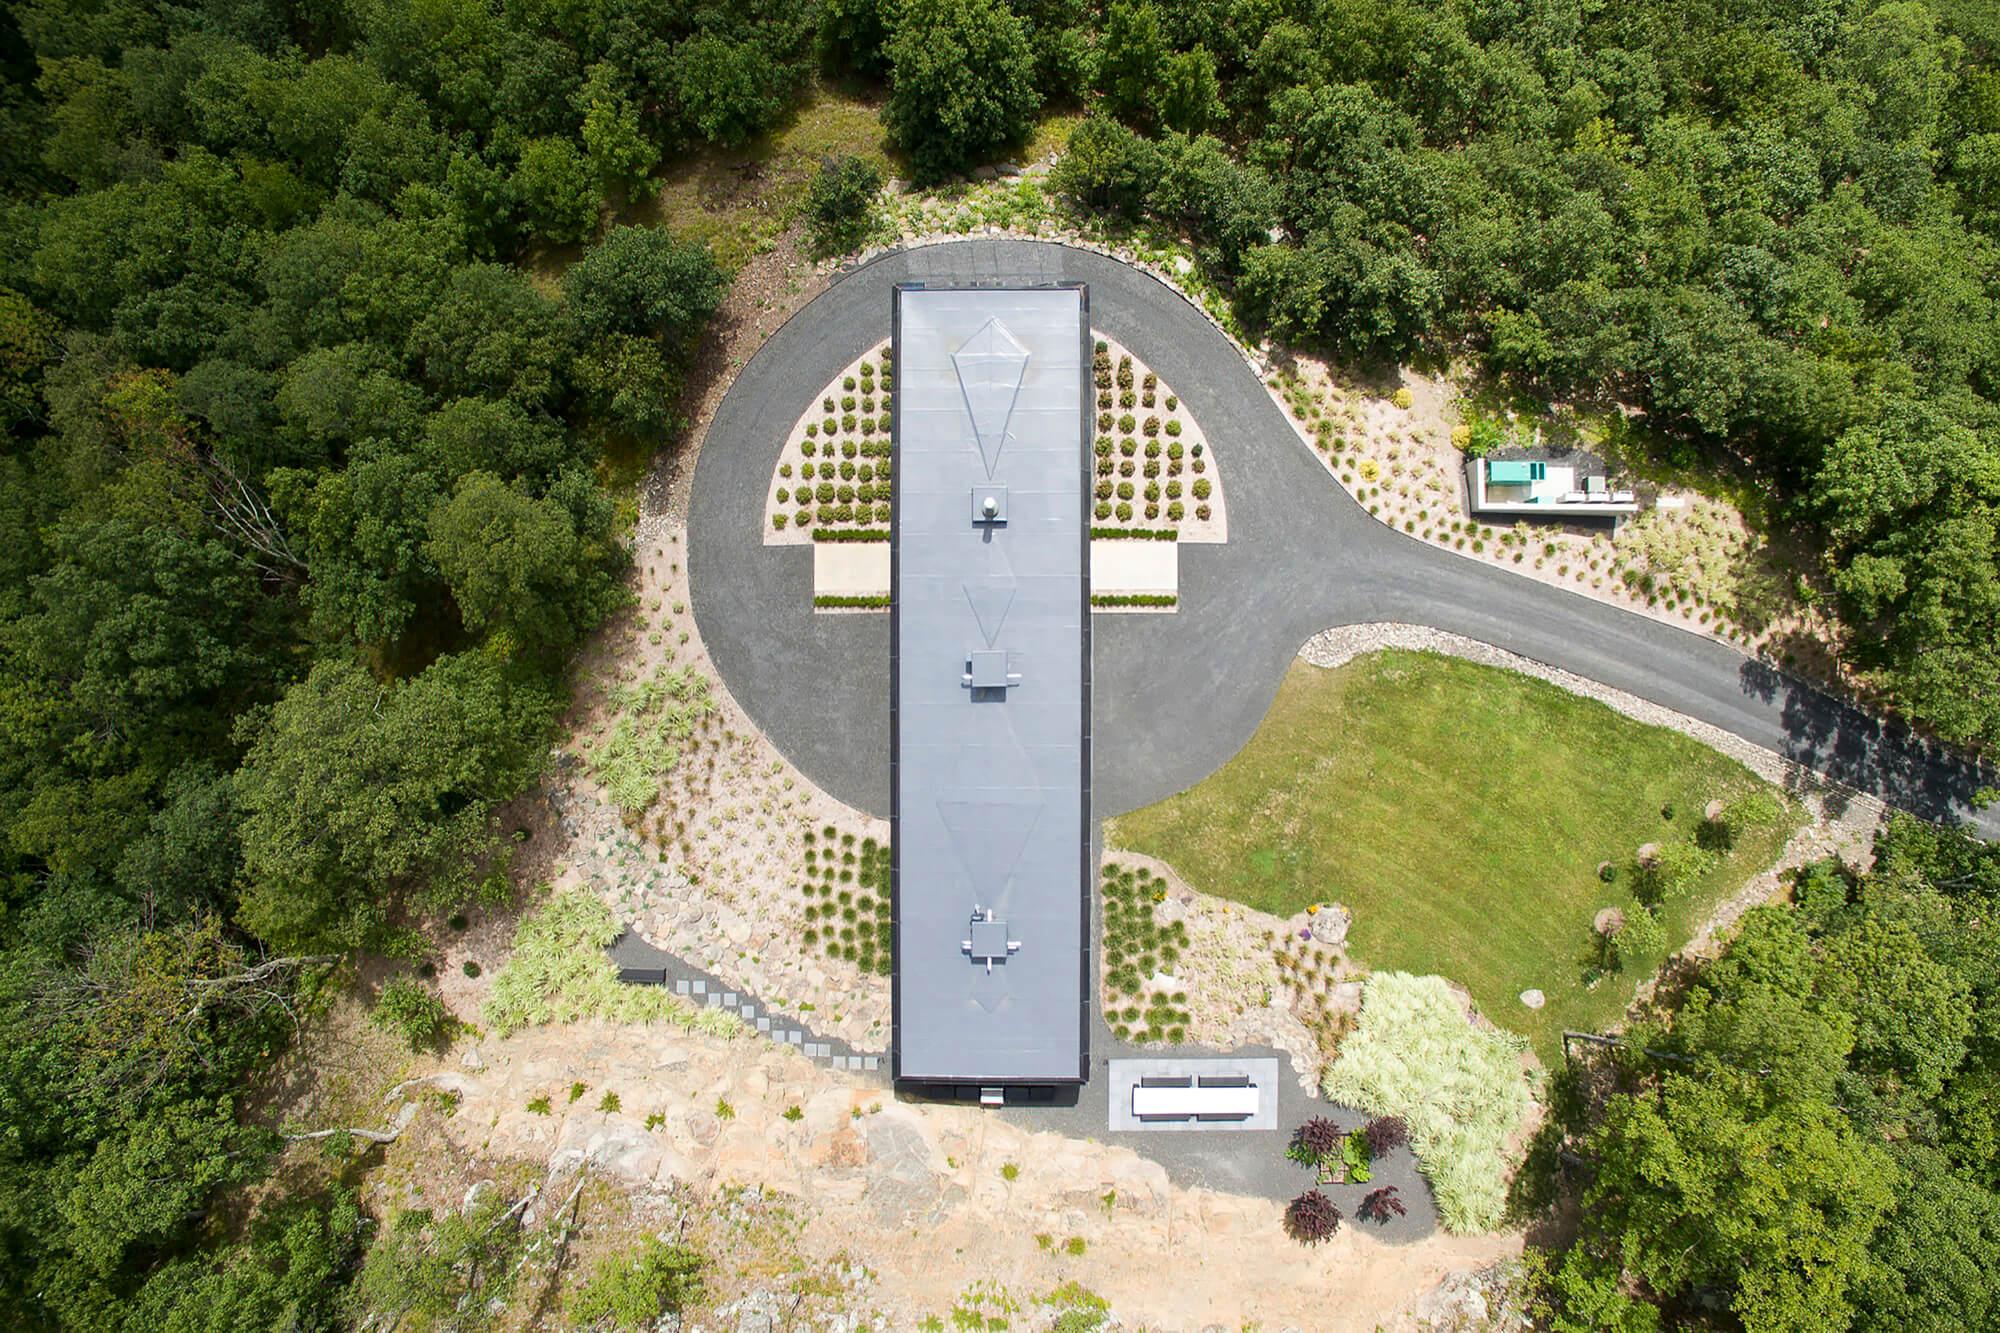 Ashokan reservoir